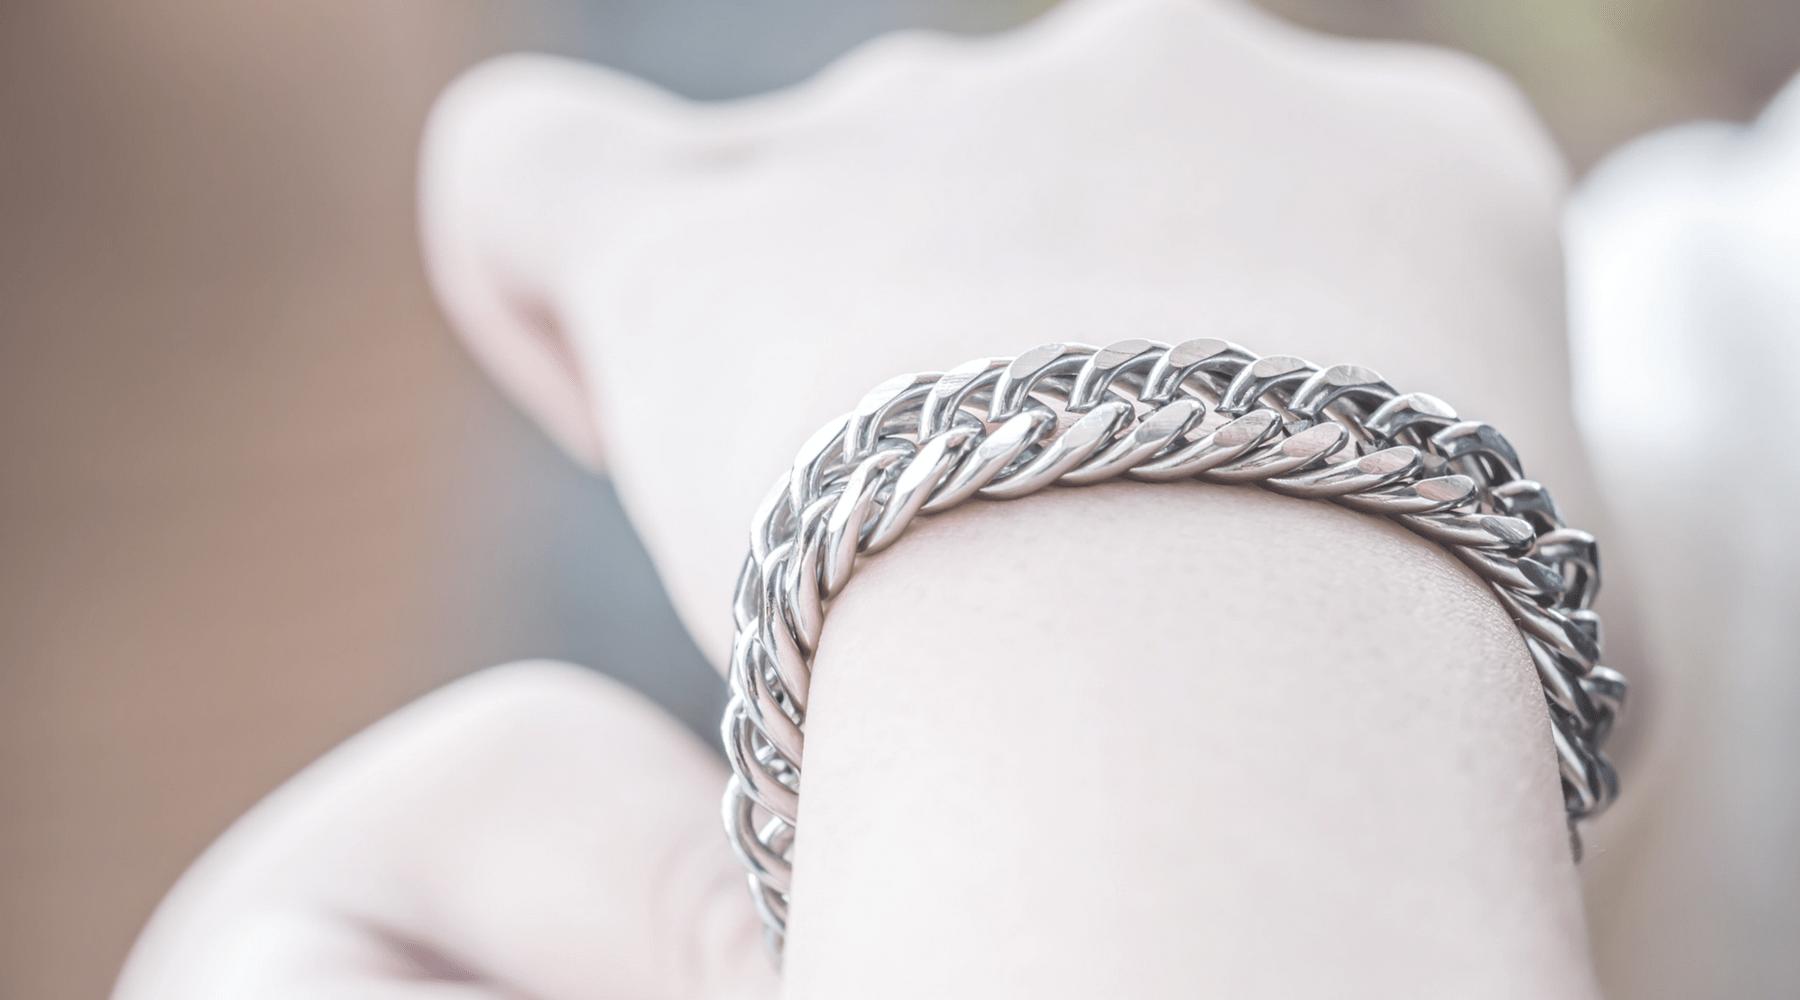 Stainless Steel Jewellery online